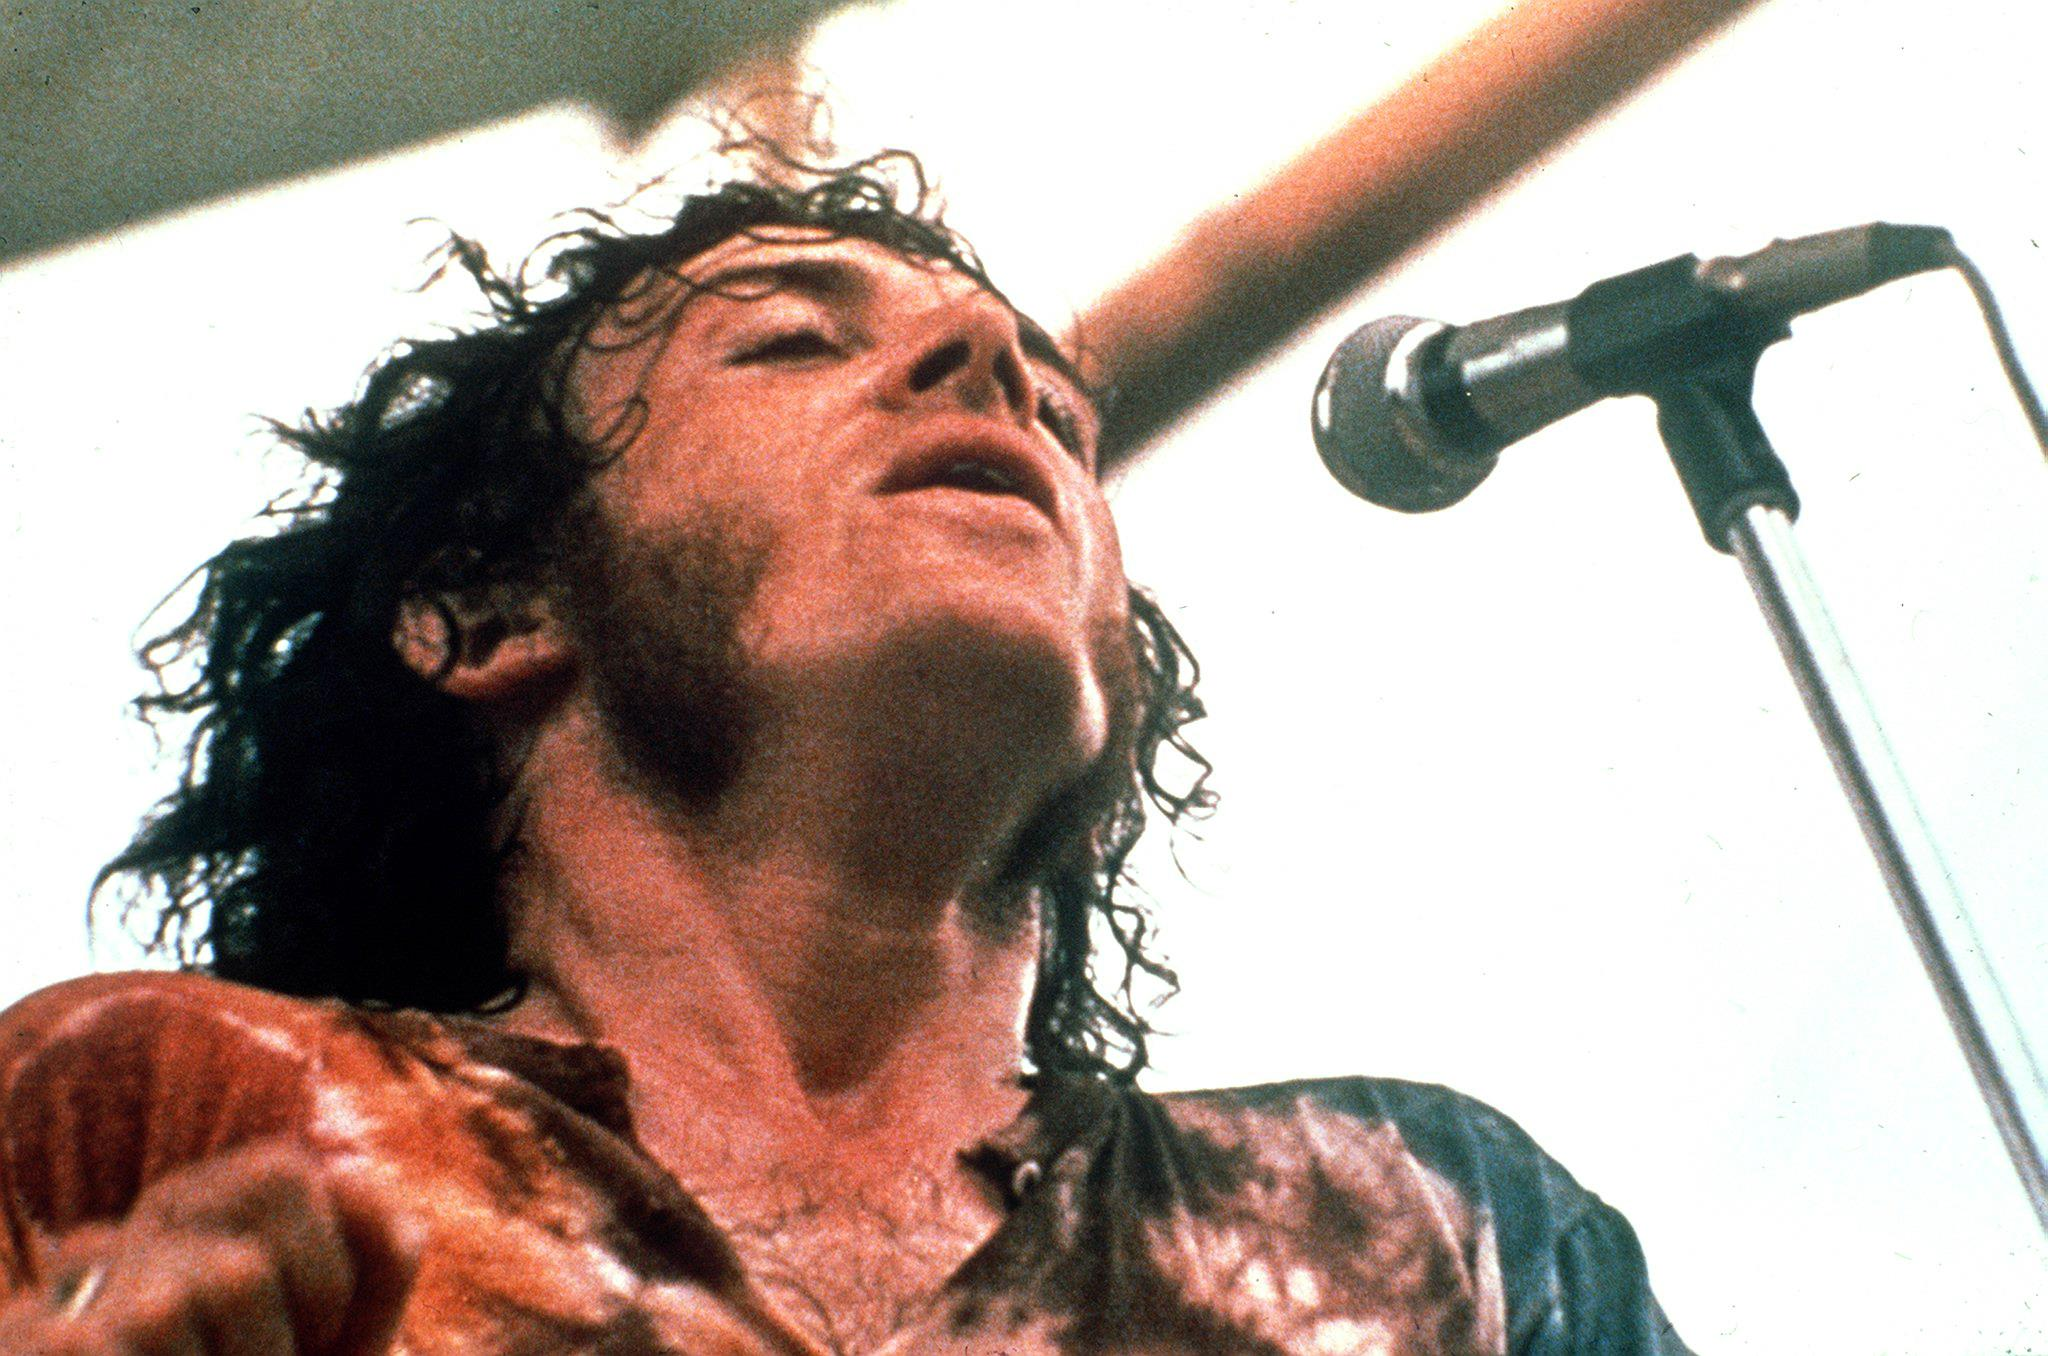 Joe Cocker, raspy-voiced rocker, dies of lung cancer at 70